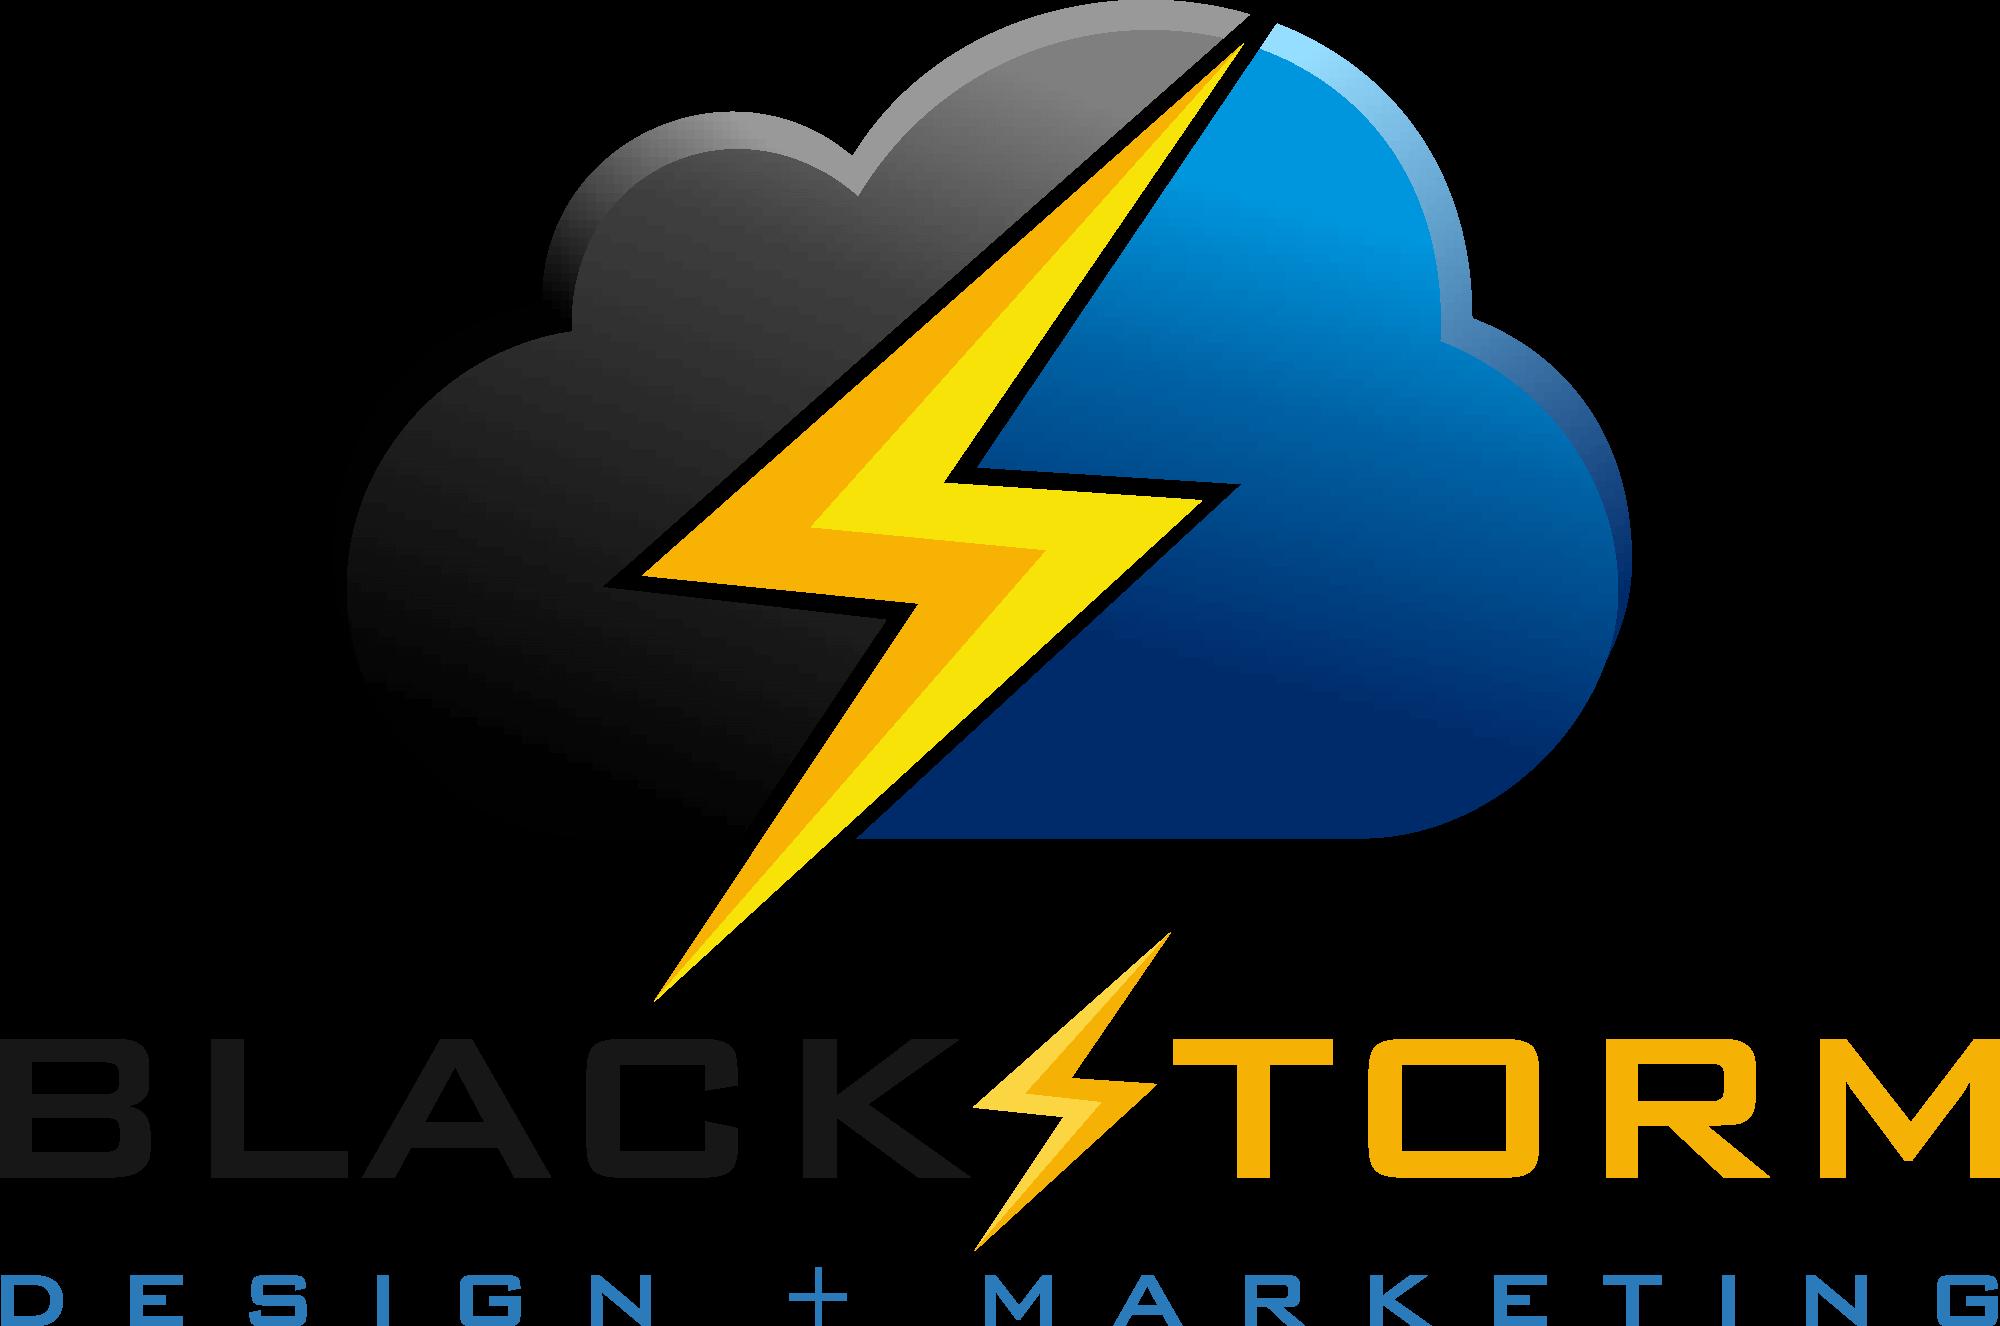 BlackStorm Design and Marketing